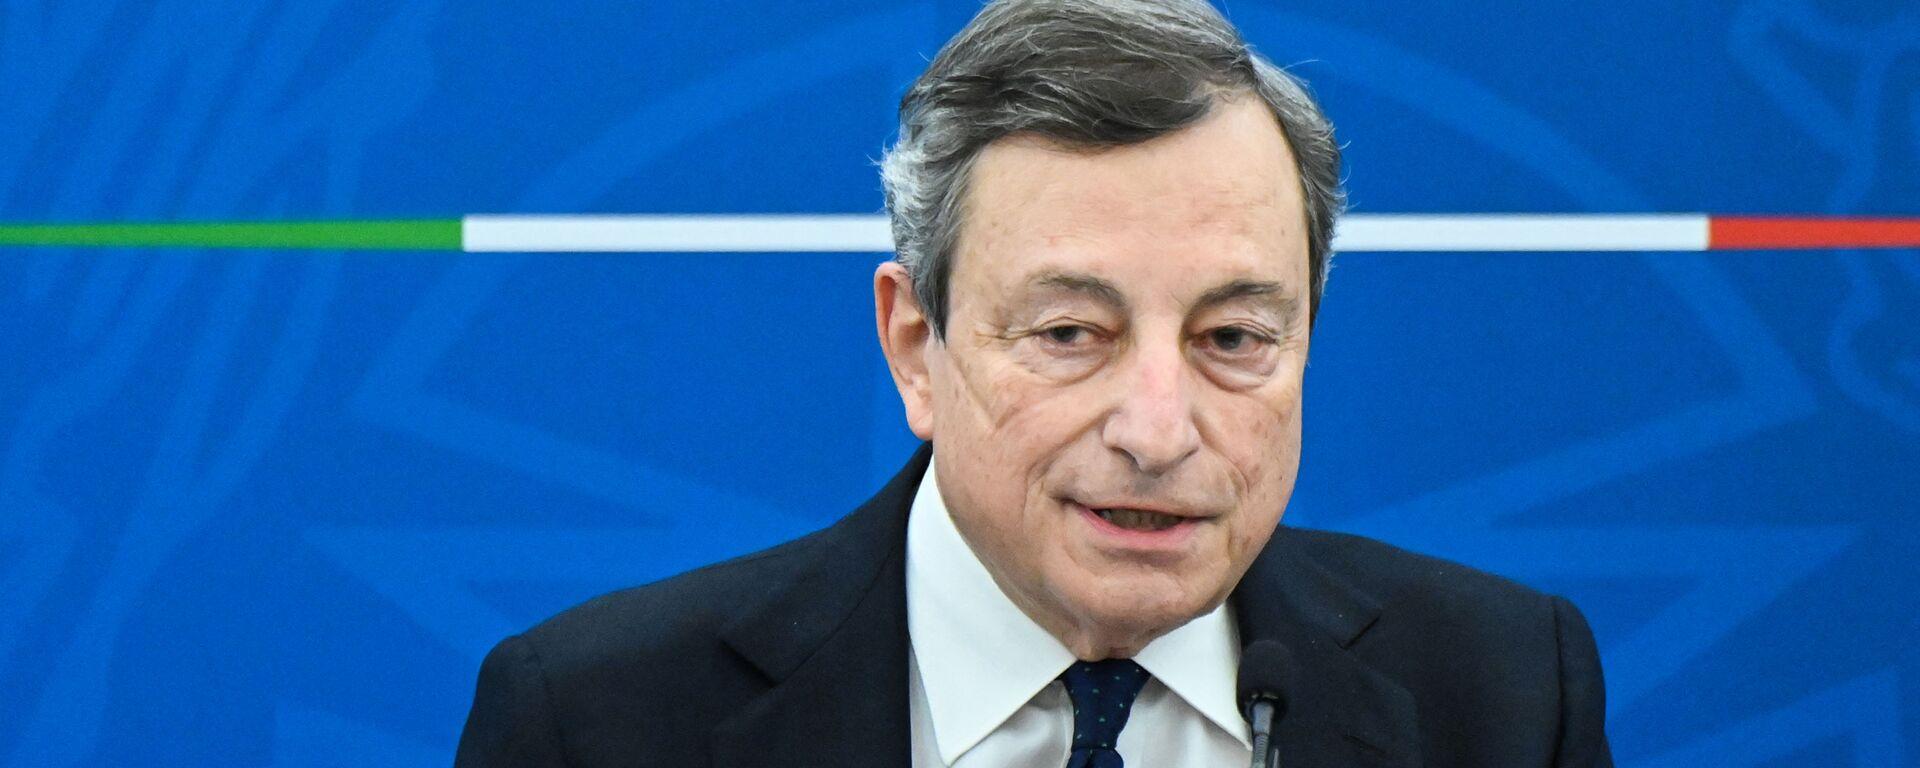 Mario Draghi - Sputnik Italia, 1920, 31.03.2021